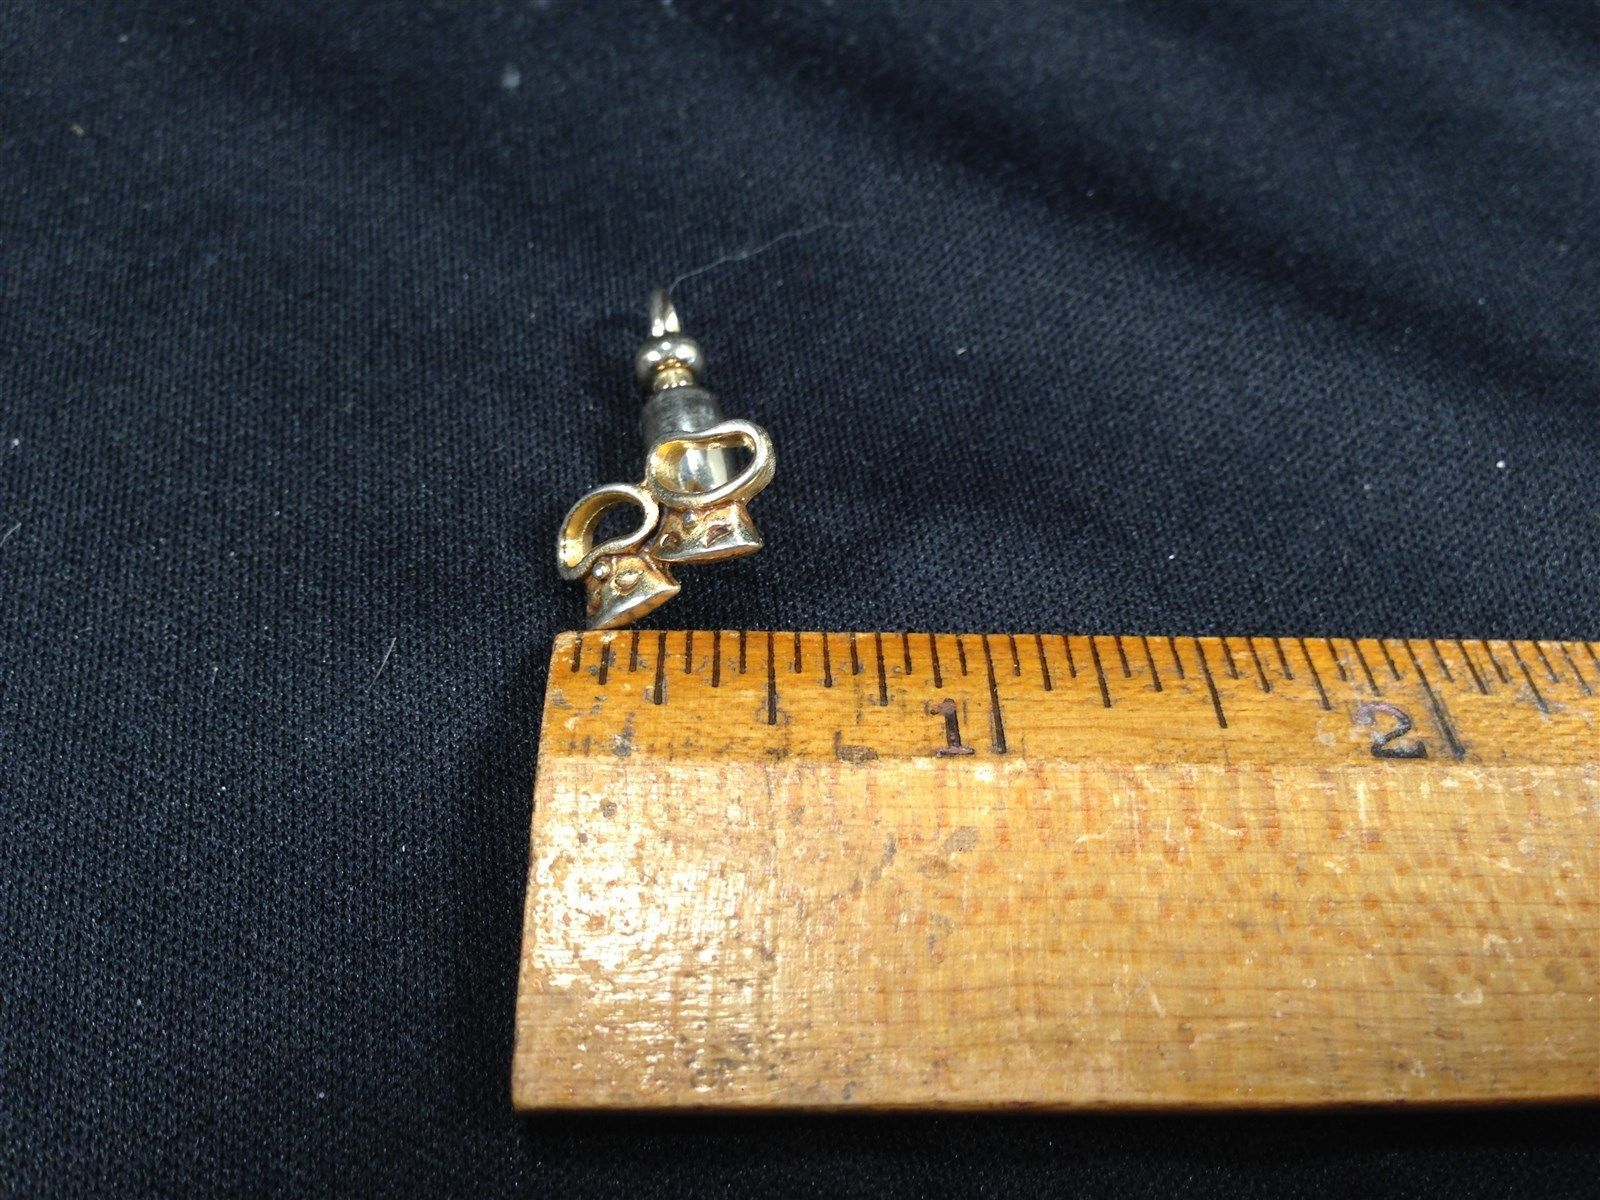 Vintage Comedy Tragedy Drama Tie Tack Pin